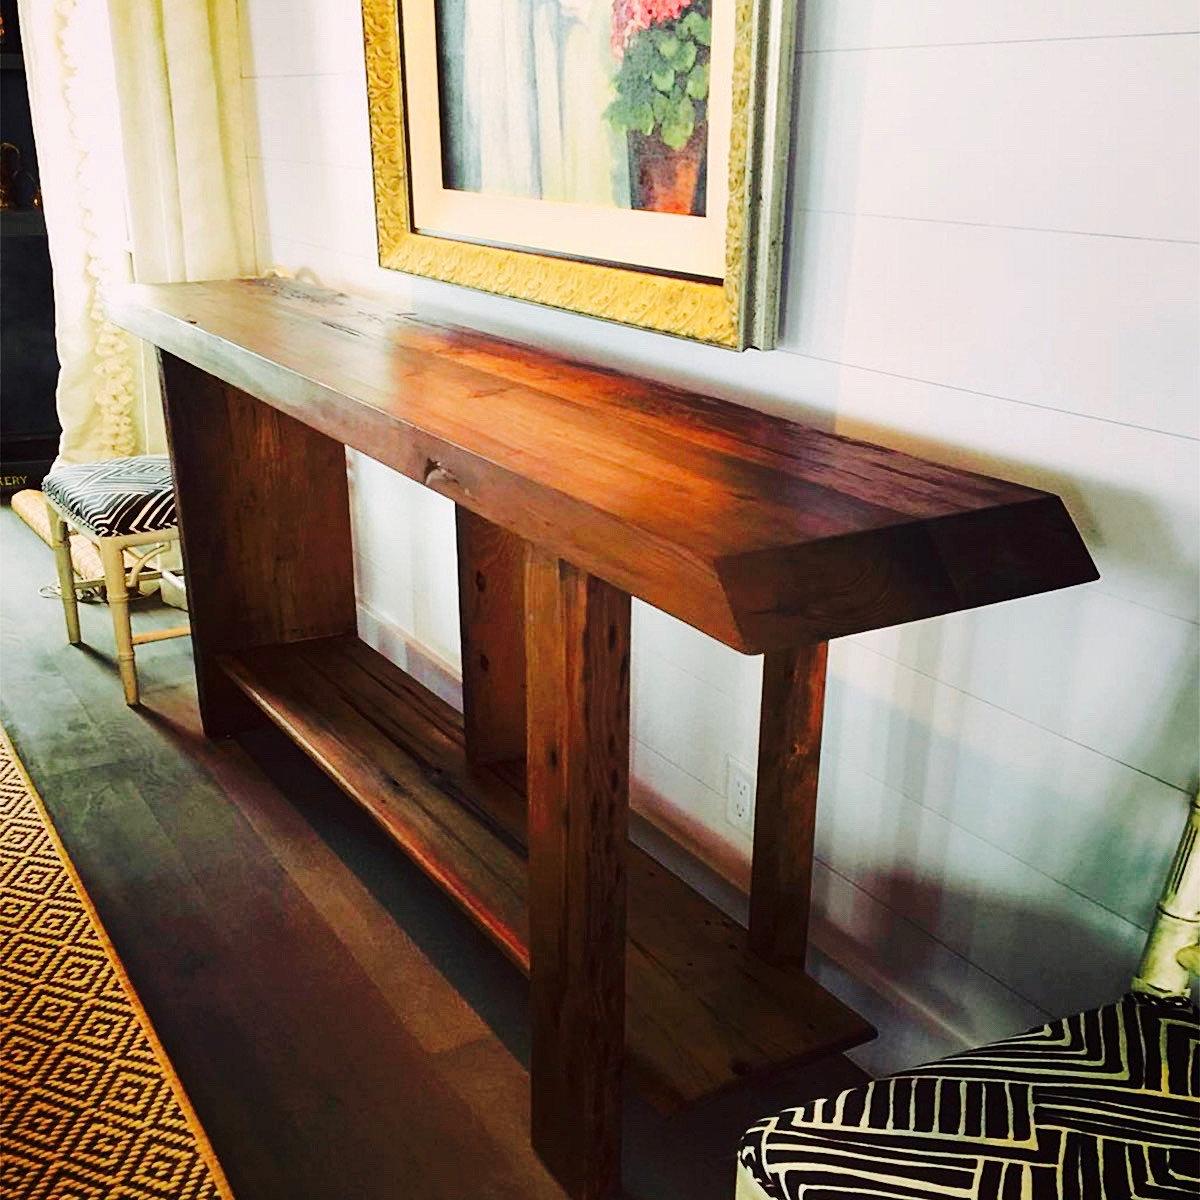 Reclaimed heart pine console table, handmade in Charleston, SC. - Salt Wood Co. - Custom Reclaimed Wood Furniture In Charleston, SC